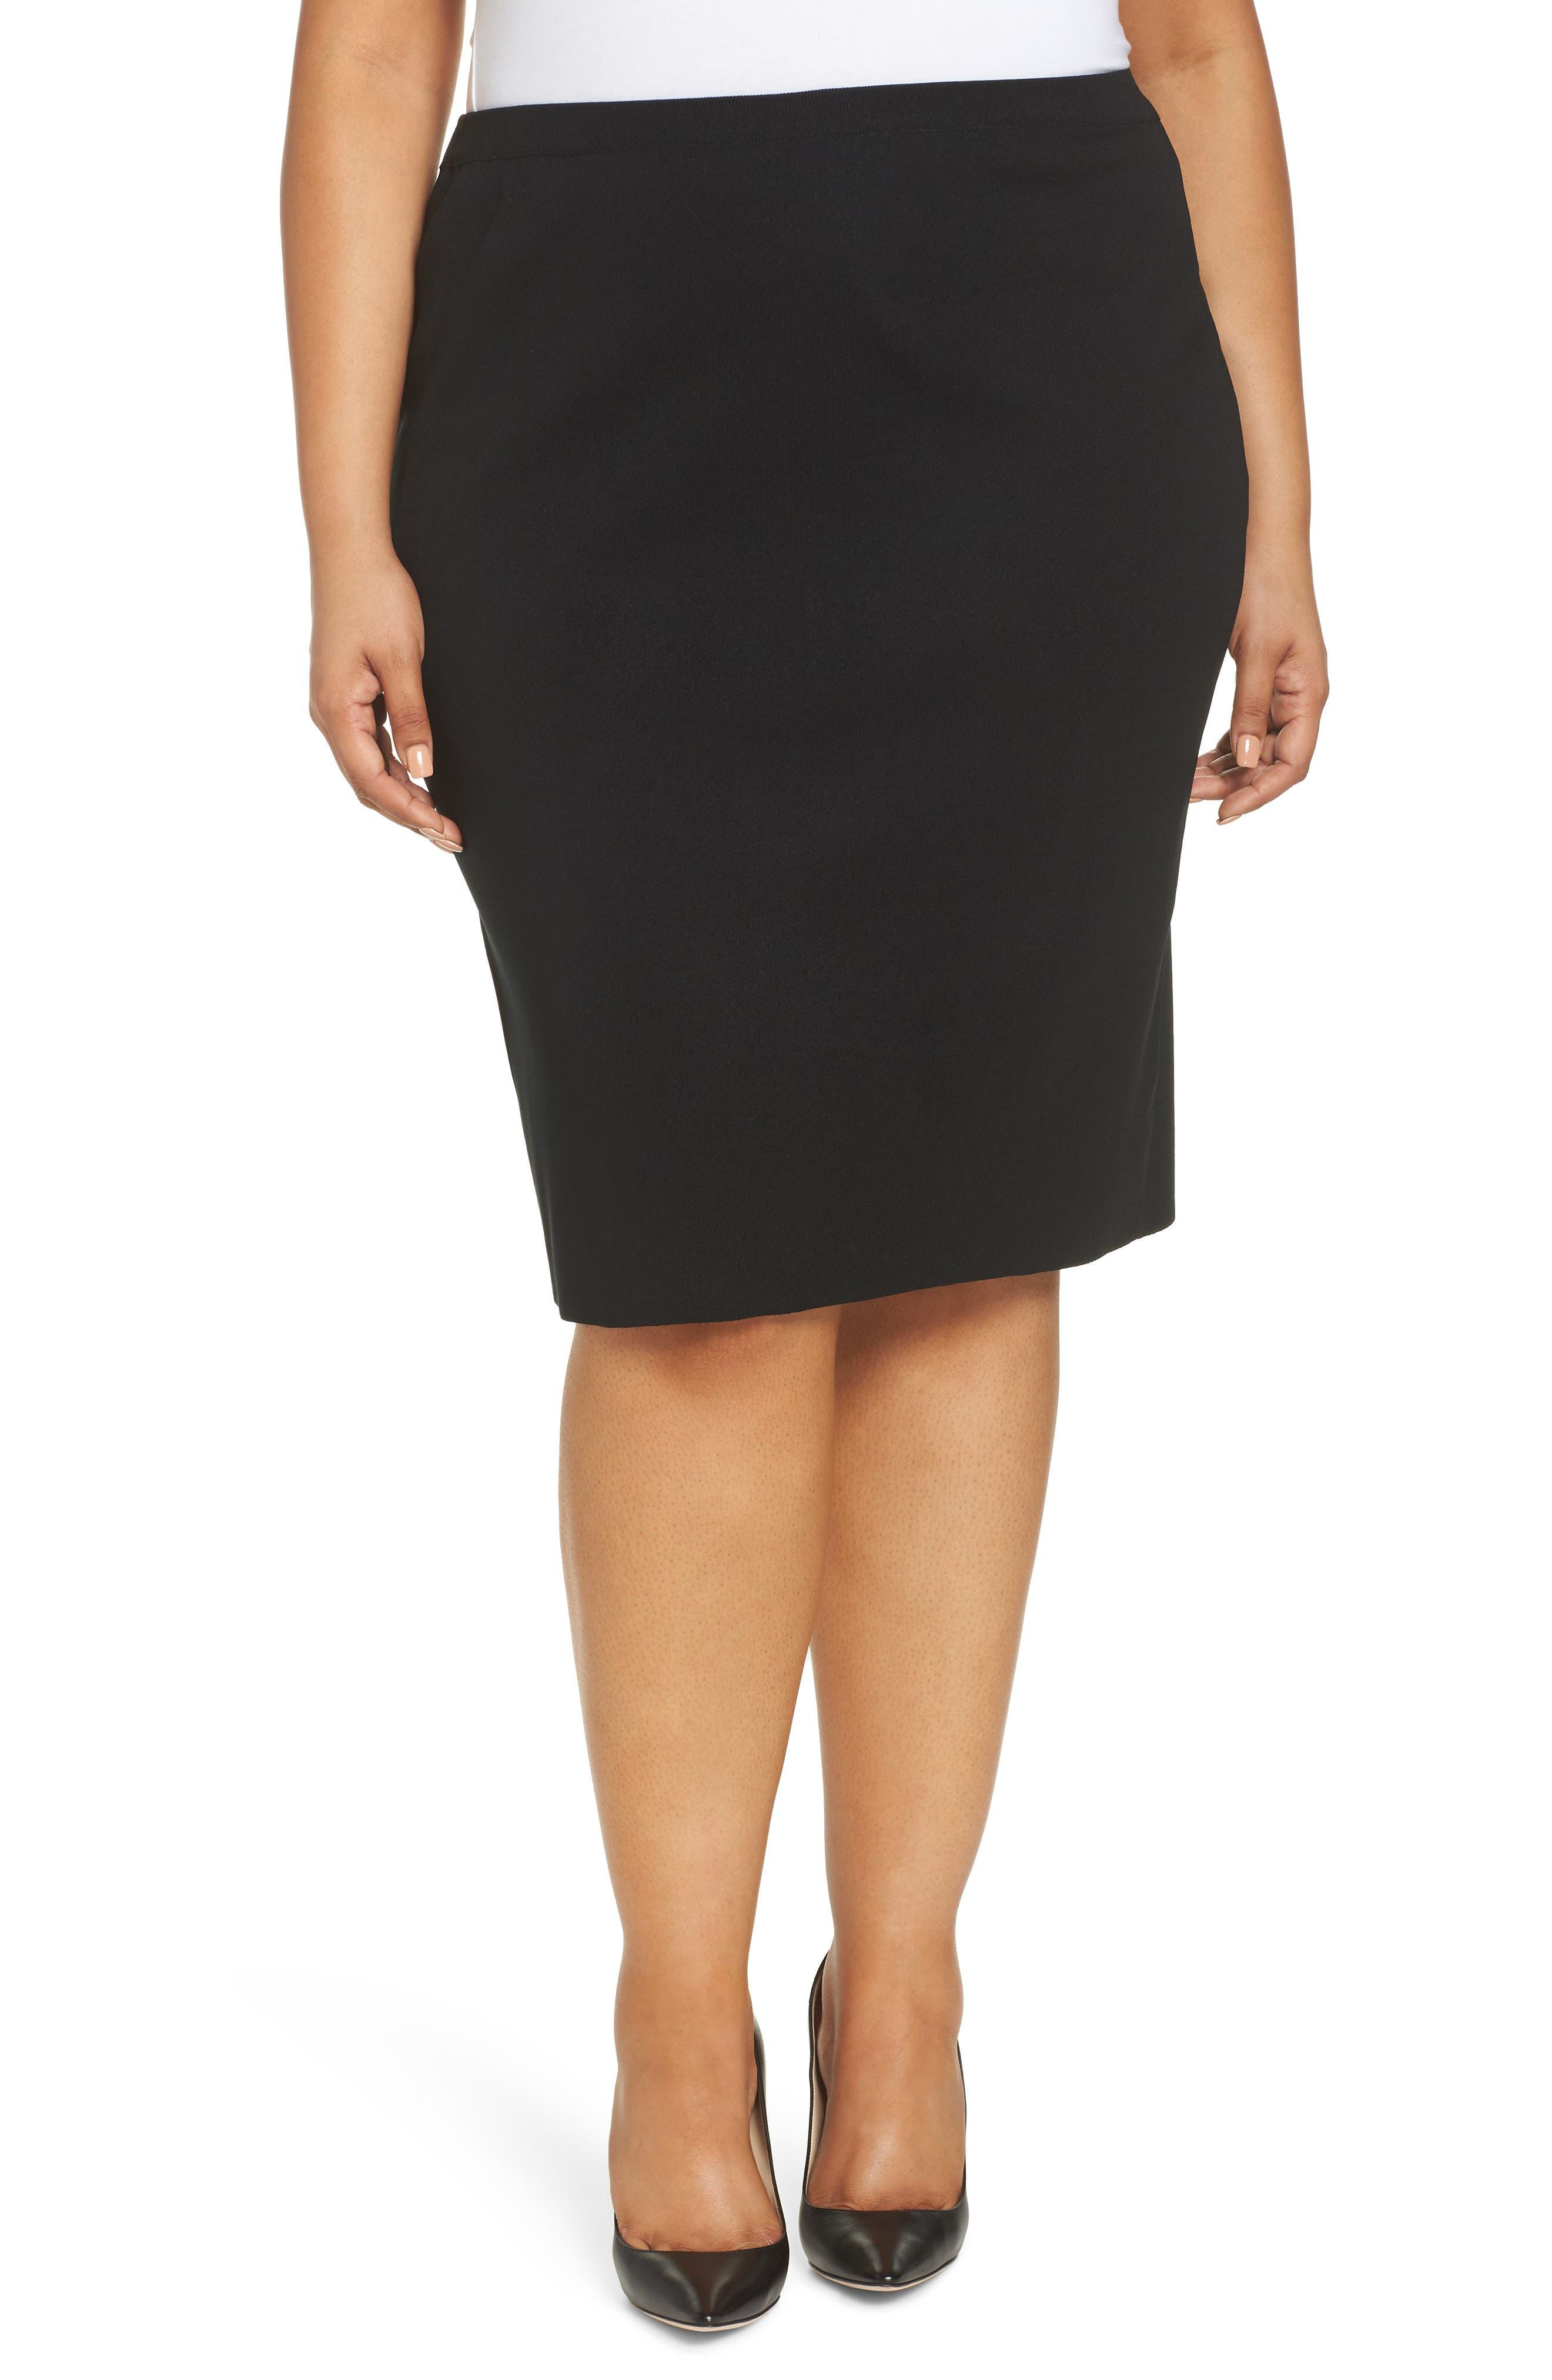 Plus Size Black Skirt